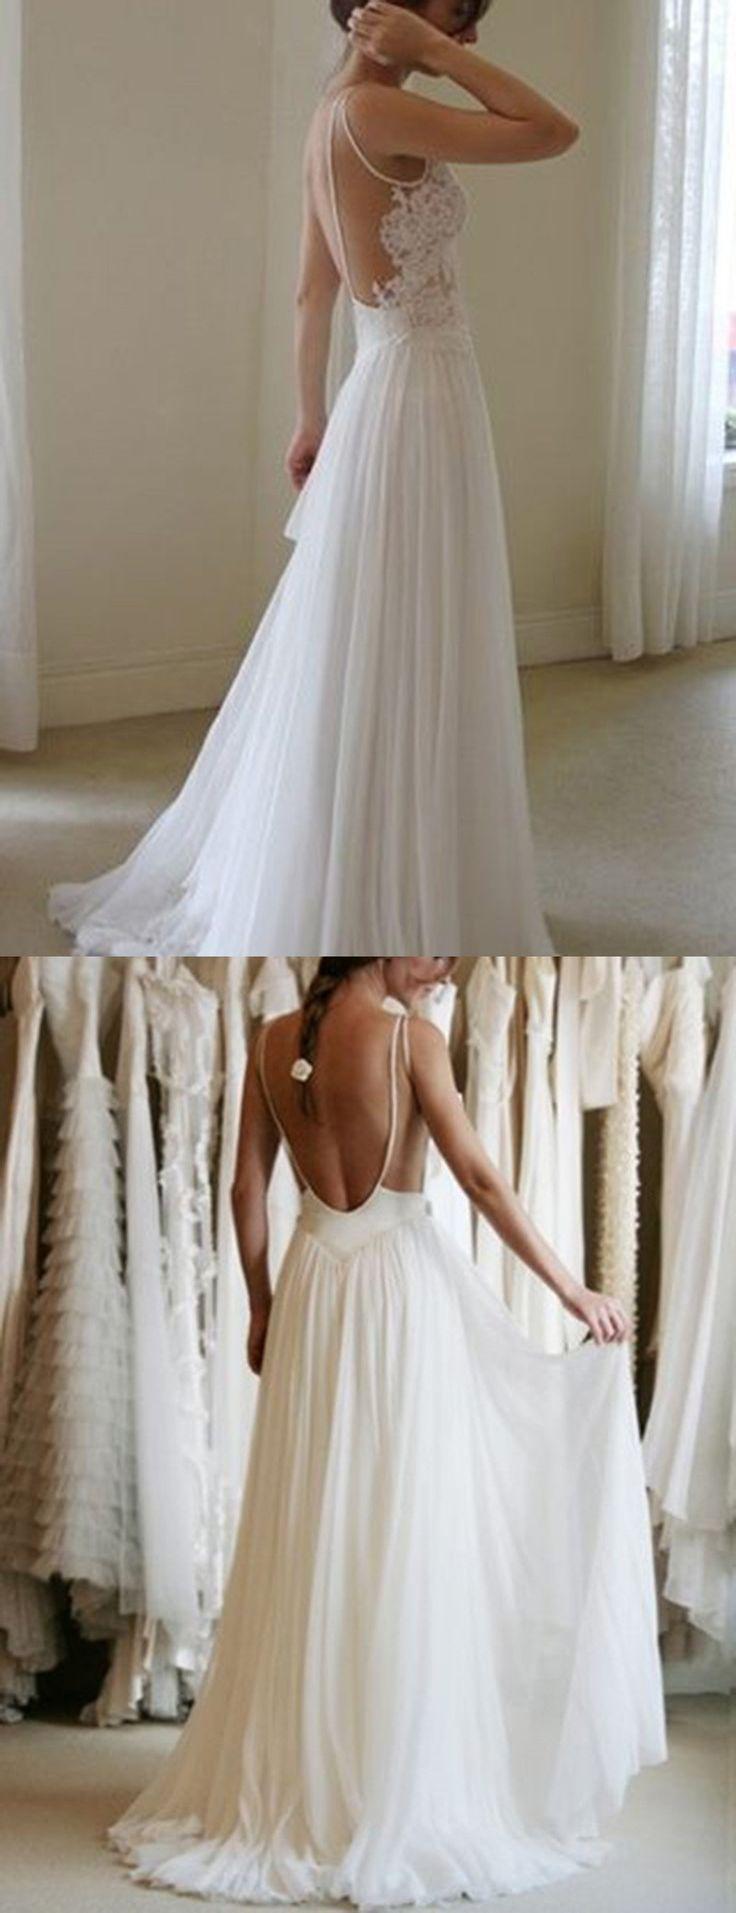 open back dresses backless wedding dress Modern Jewel Sleeveless Sweep Train Backless Wedding Dress with Lace